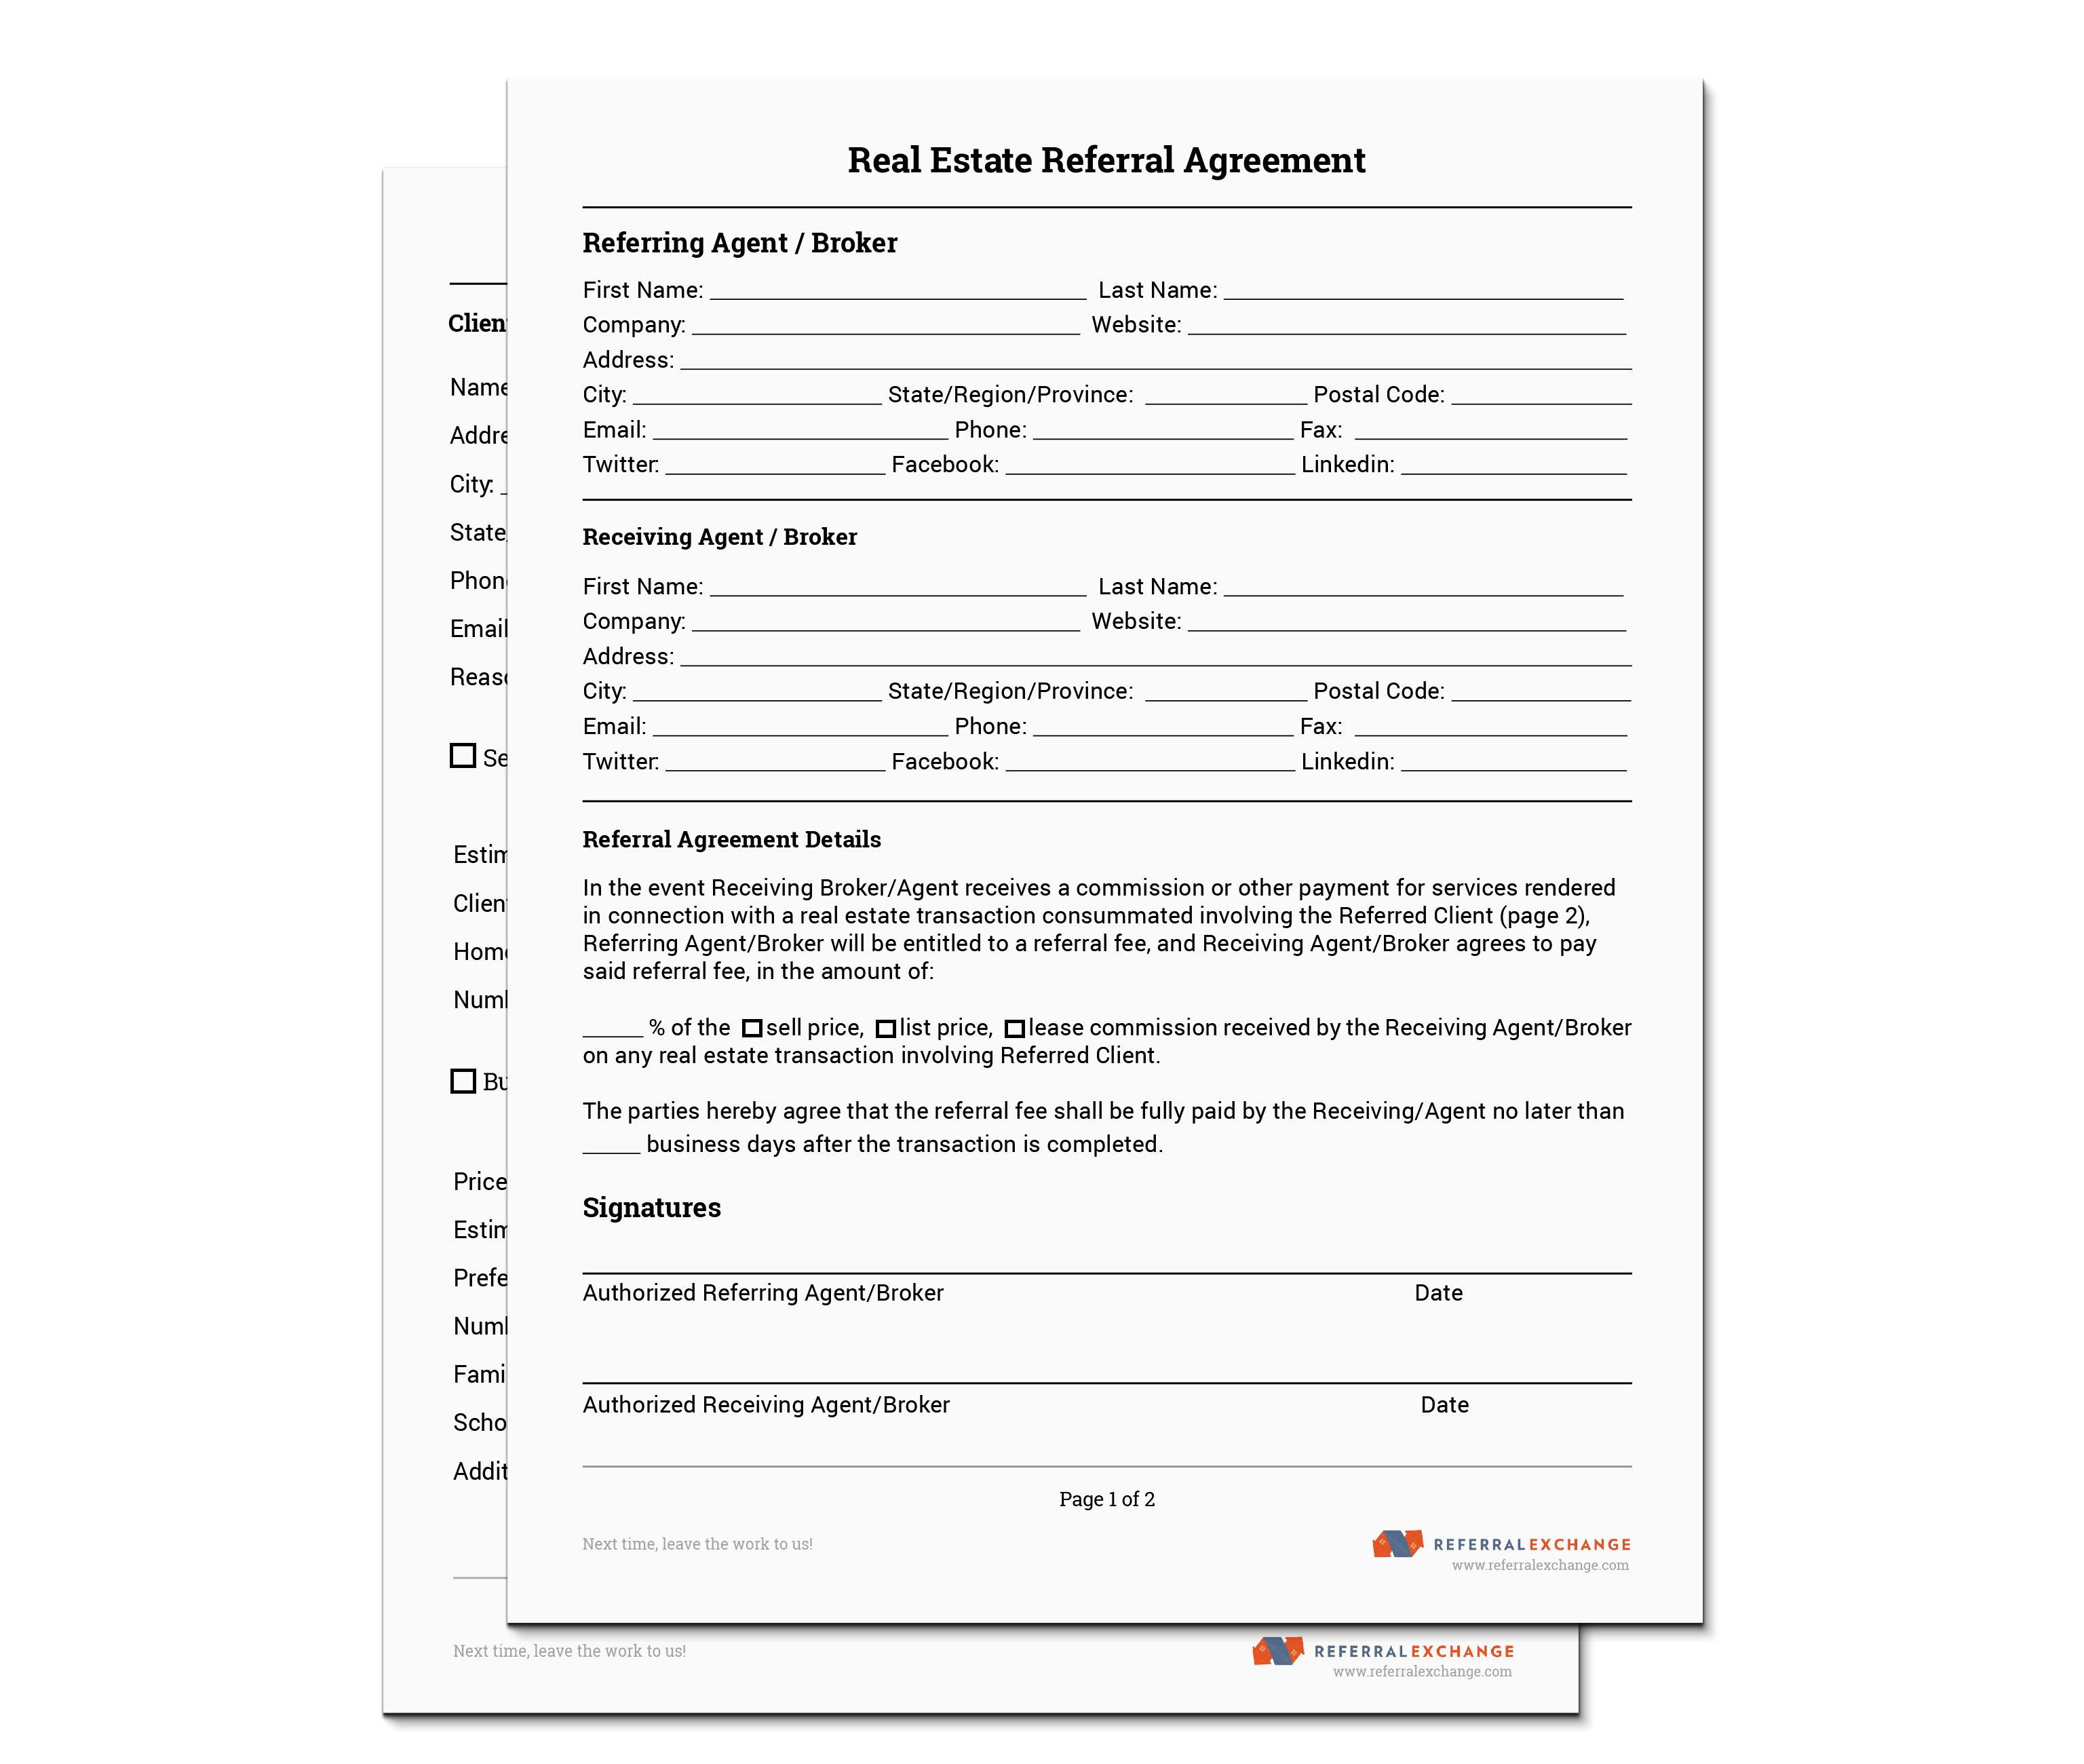 Referral Agreement Template Australia